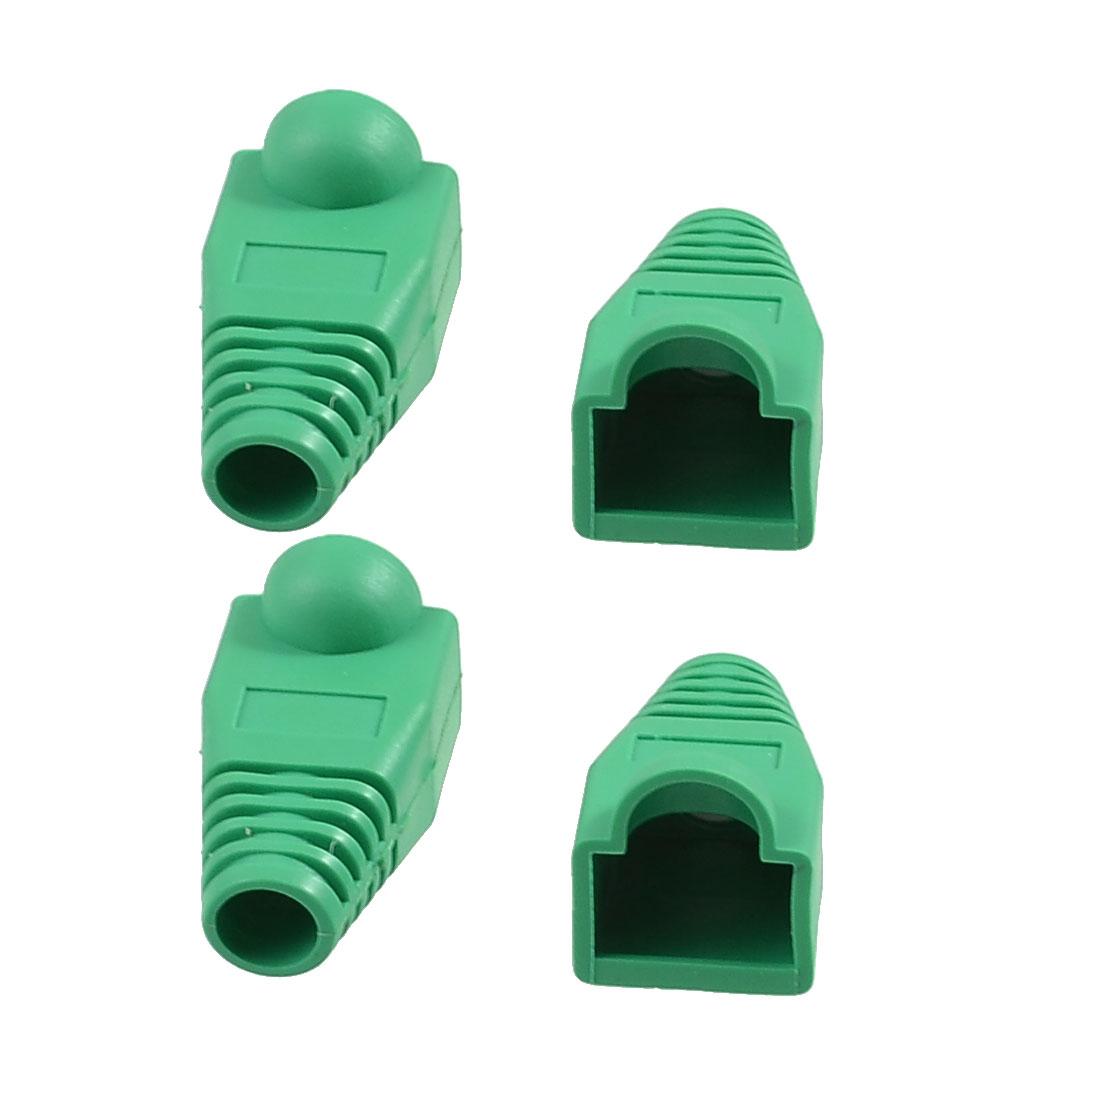 4 Pcs Green Plastic Network Cable Boot Cap Cover for RJ-45 Connectors